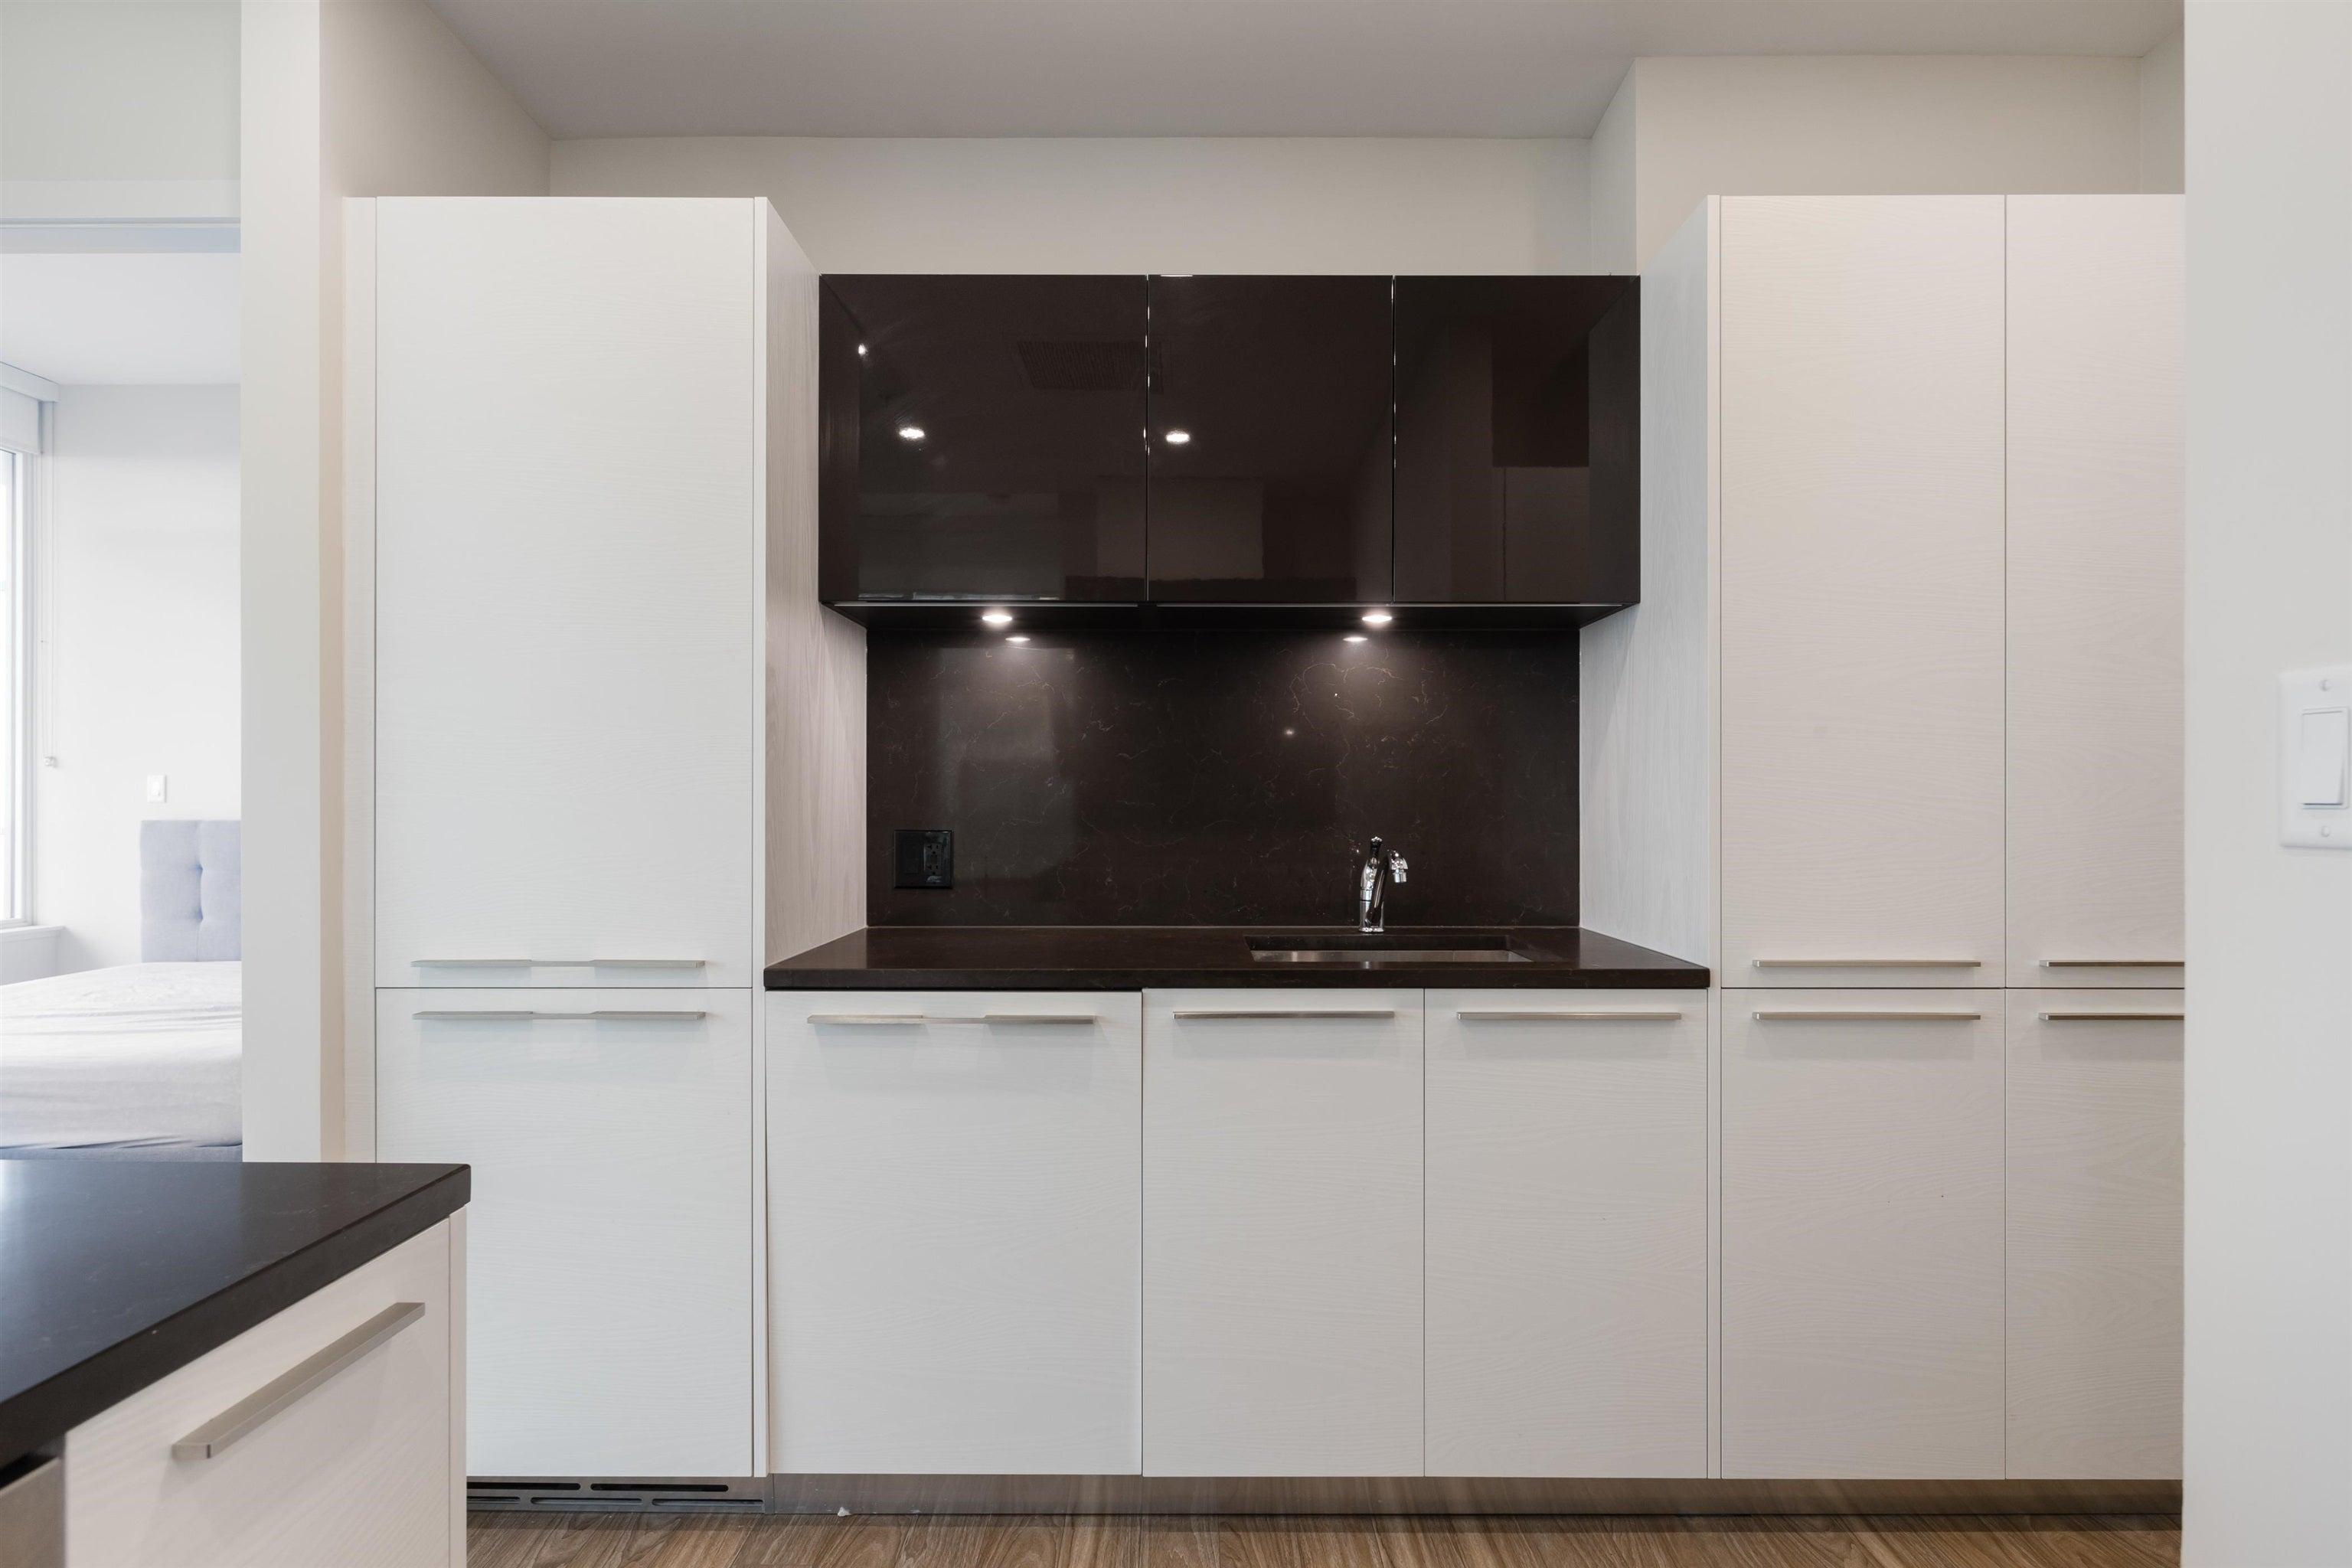 2206 6383 MCKAY AVENUE - Metrotown Apartment/Condo for sale, 2 Bedrooms (R2625647) - #12